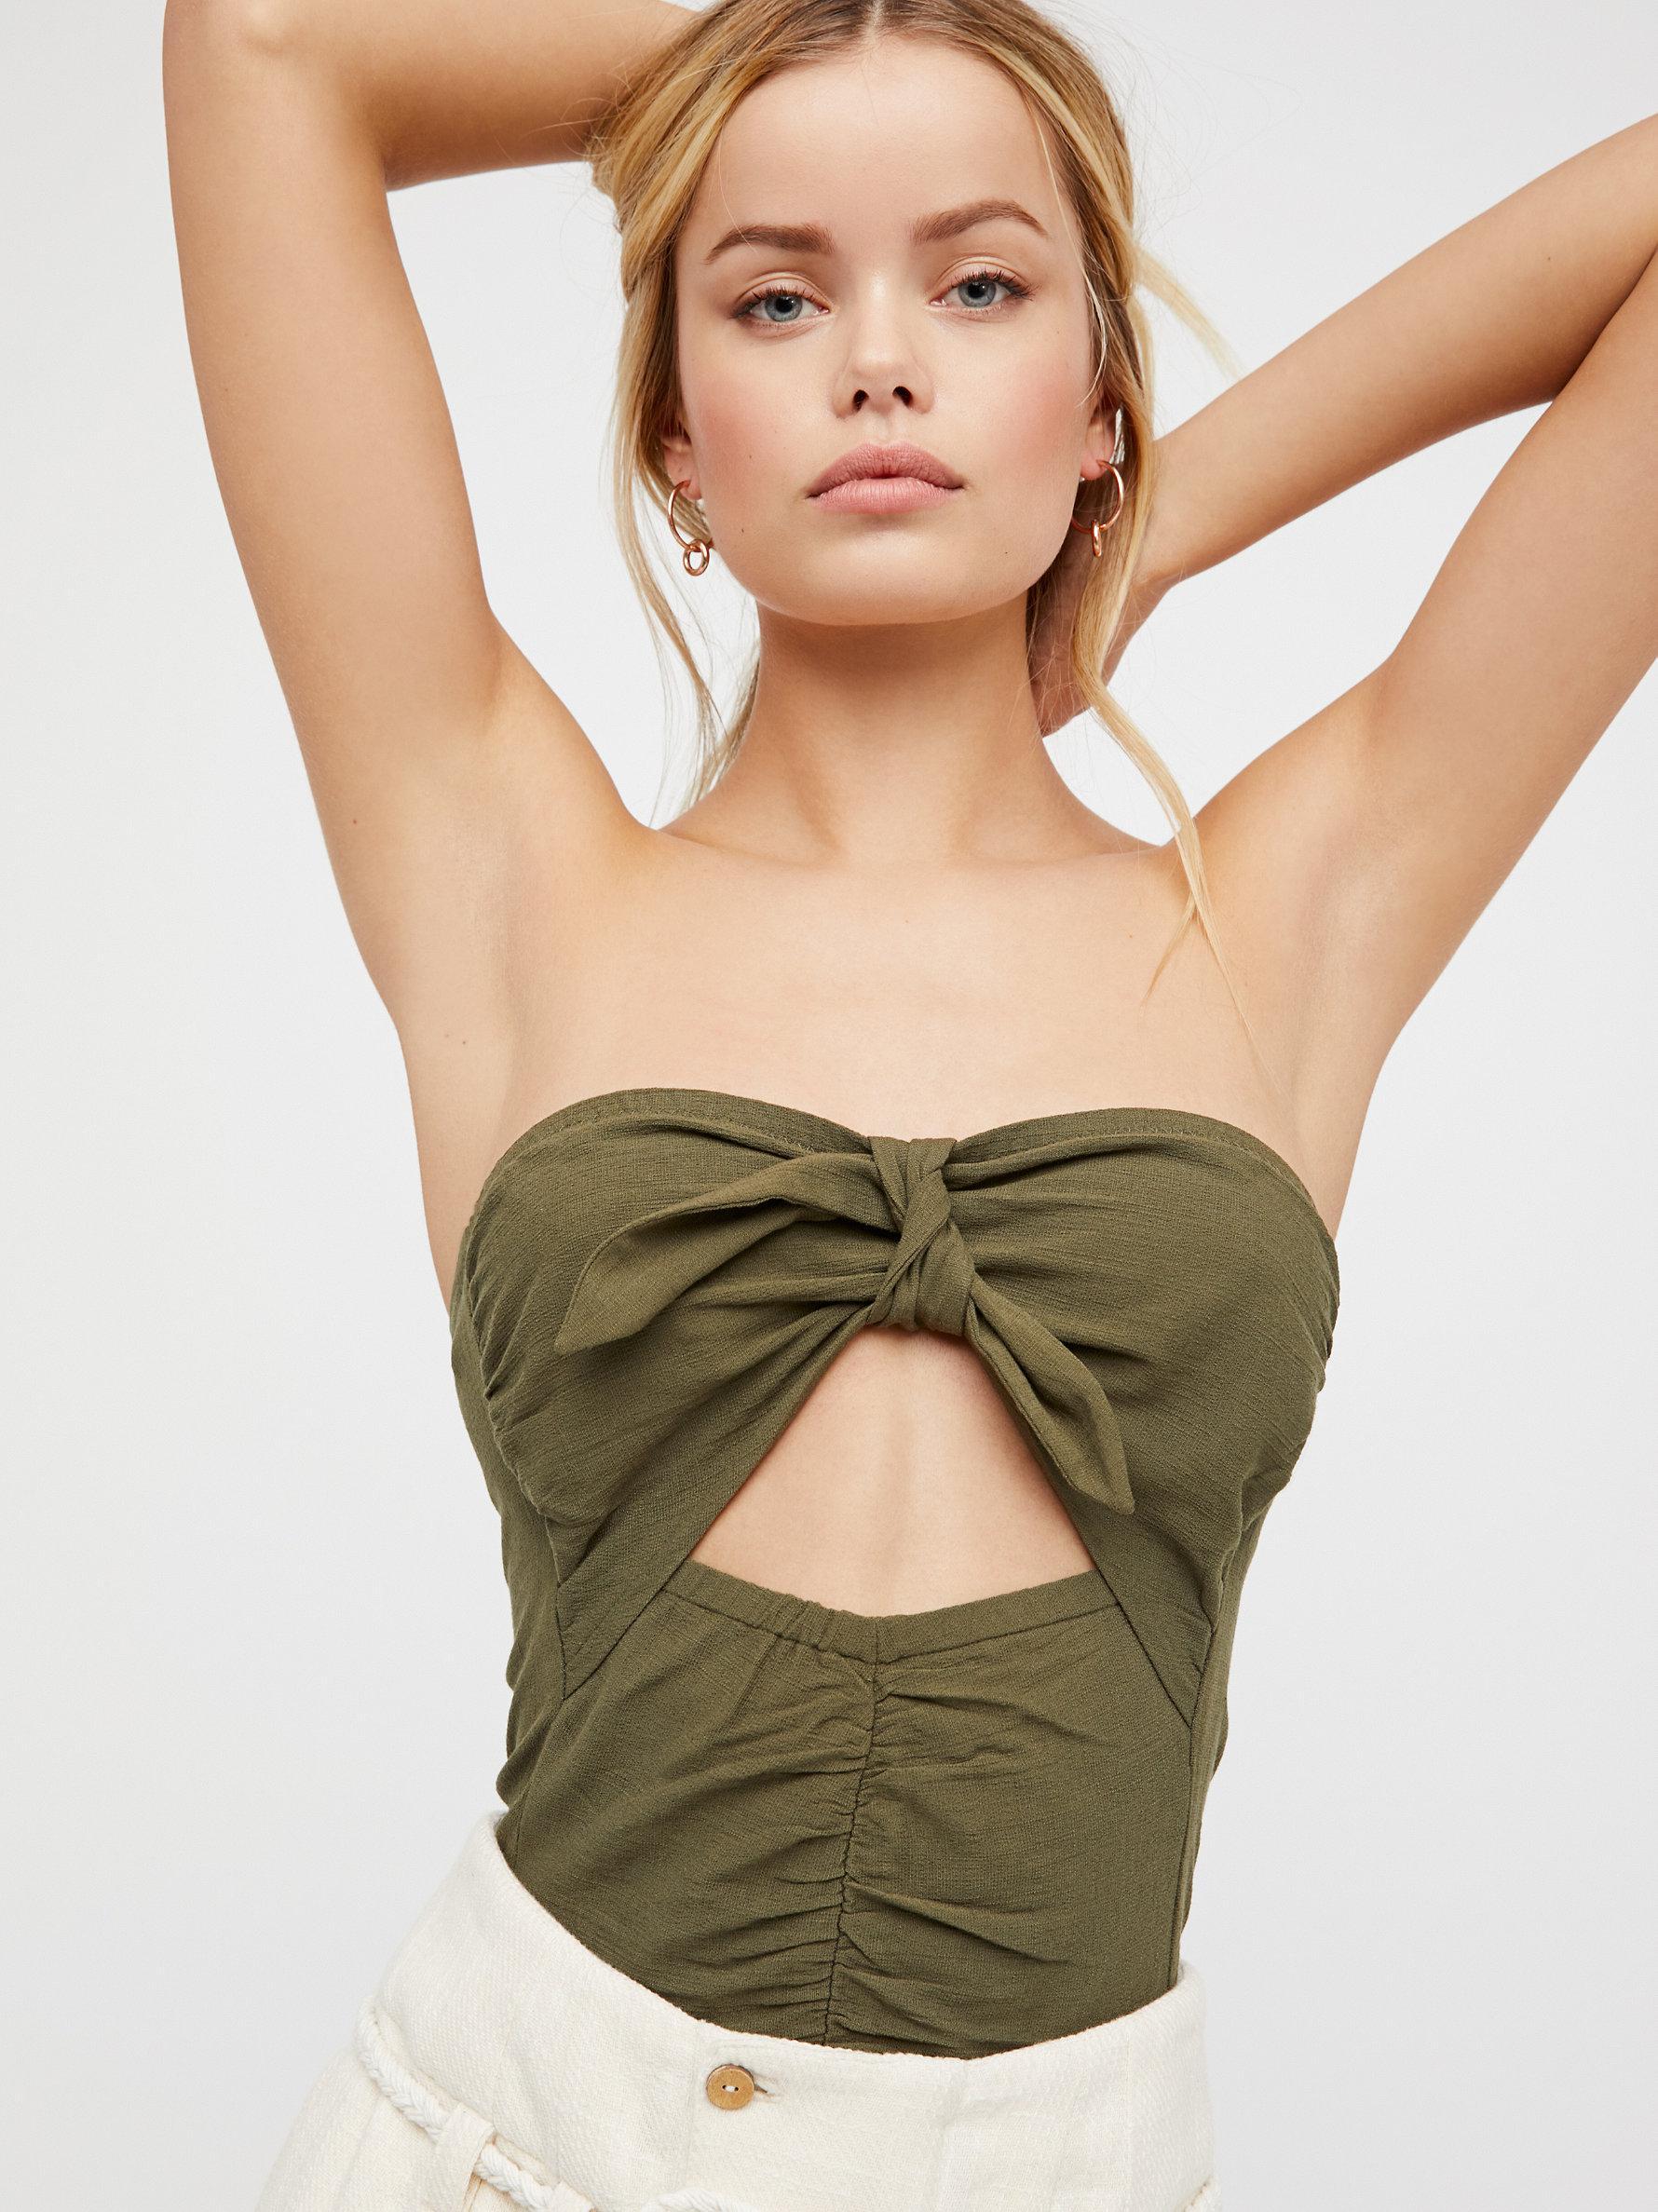 Skinny ebony nude